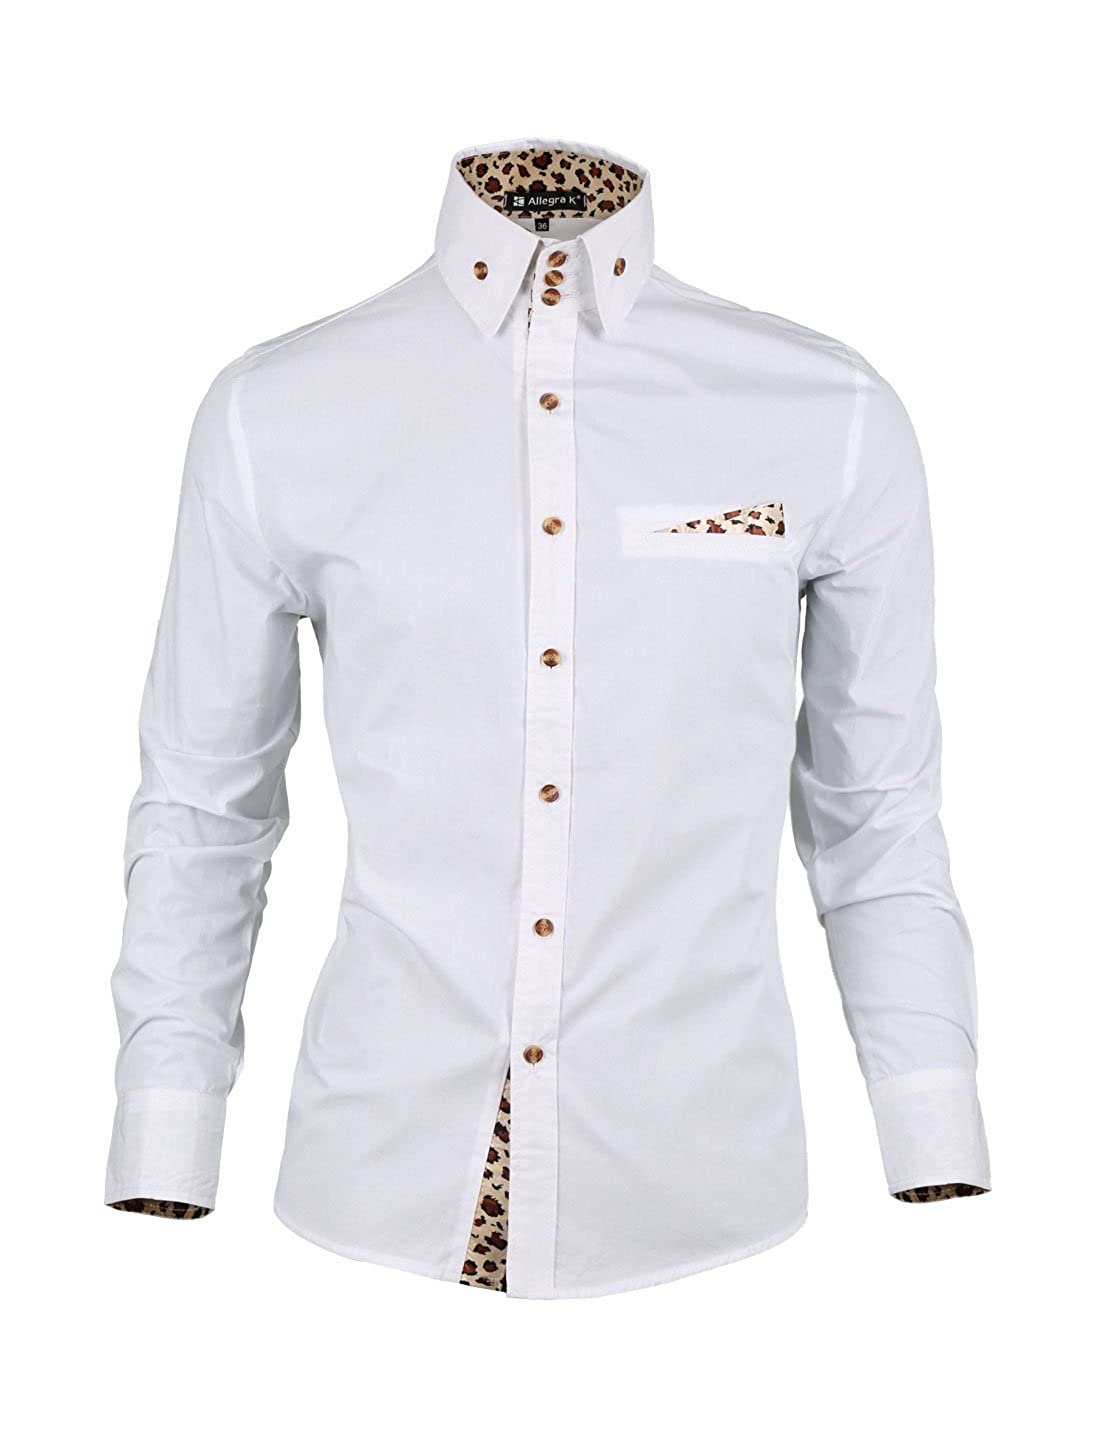 0ab05c9df165 Allegra K Men Leopard Prints Decor Mock Pocket Long Sleeves Button Down  Shirt at Amazon Men's Clothing store: Button Down Shirts